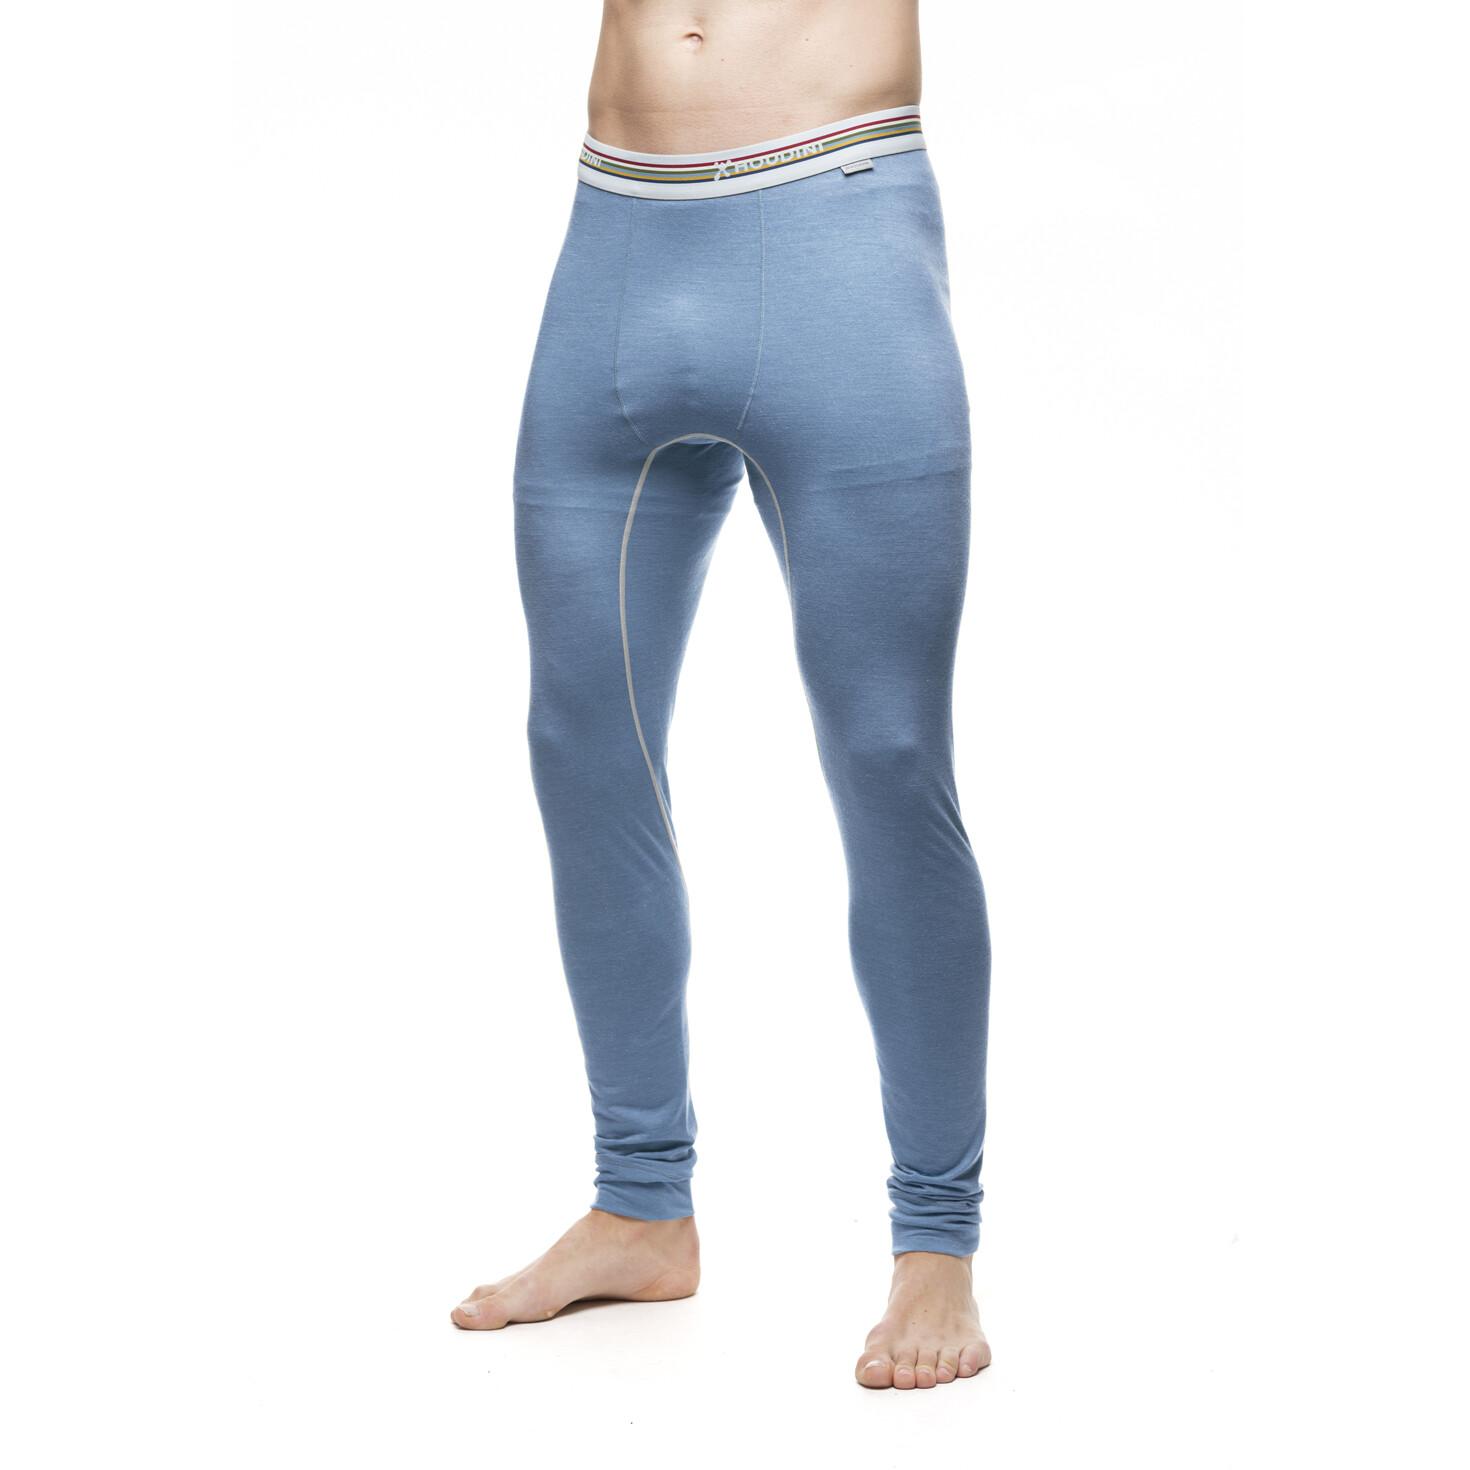 Houdini Airborn Tights Men blue ridge S outdoorunterwäsche~outdoor unterwäsche~unterwäsche~unterwäsche merino~unterwäsche merinowolle